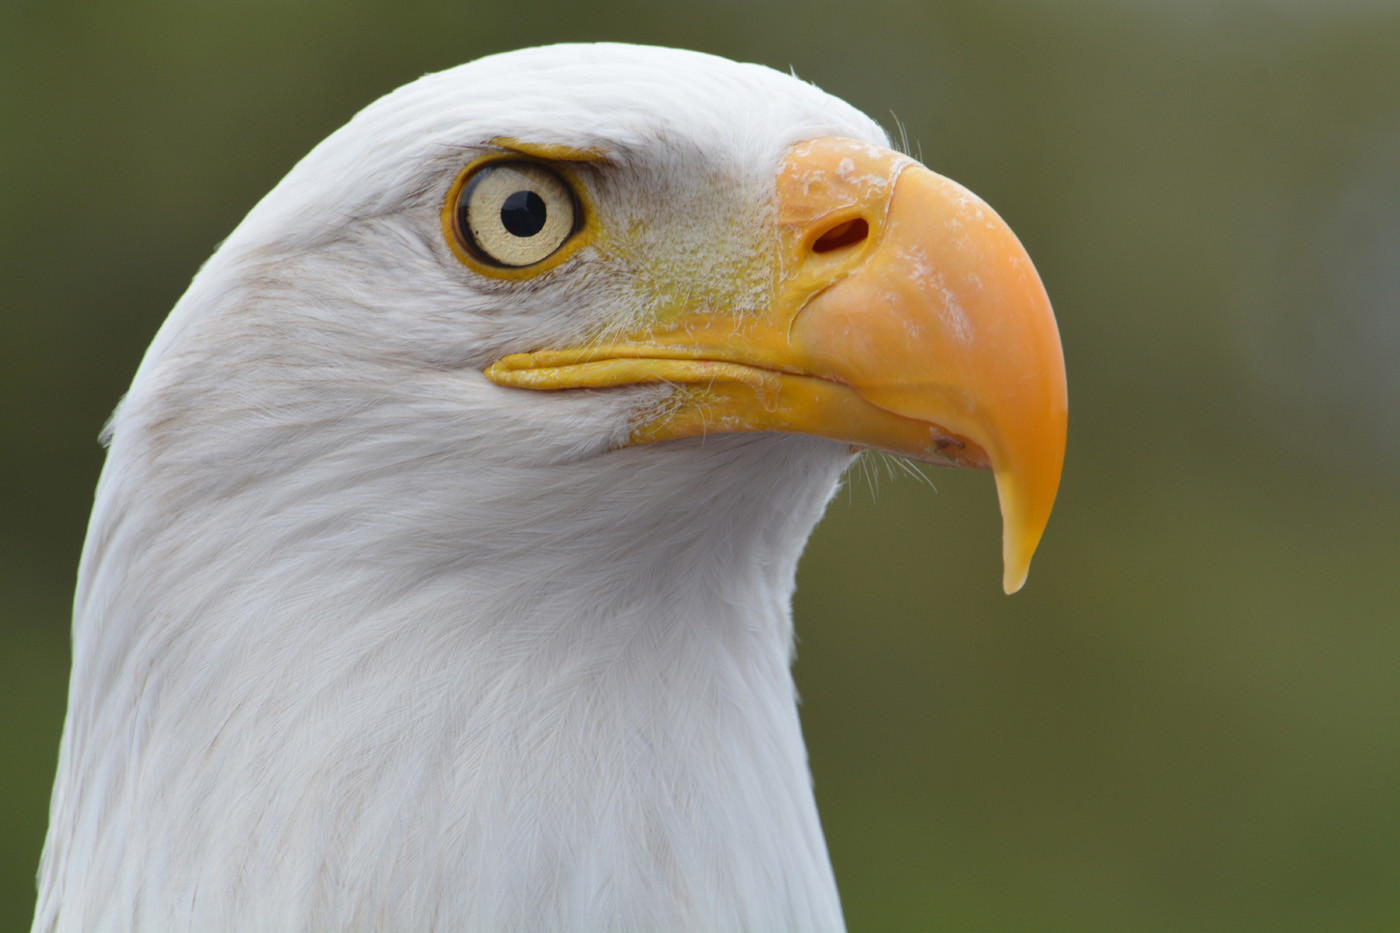 17 BALD HEADED EAGLE by Helen Mossman